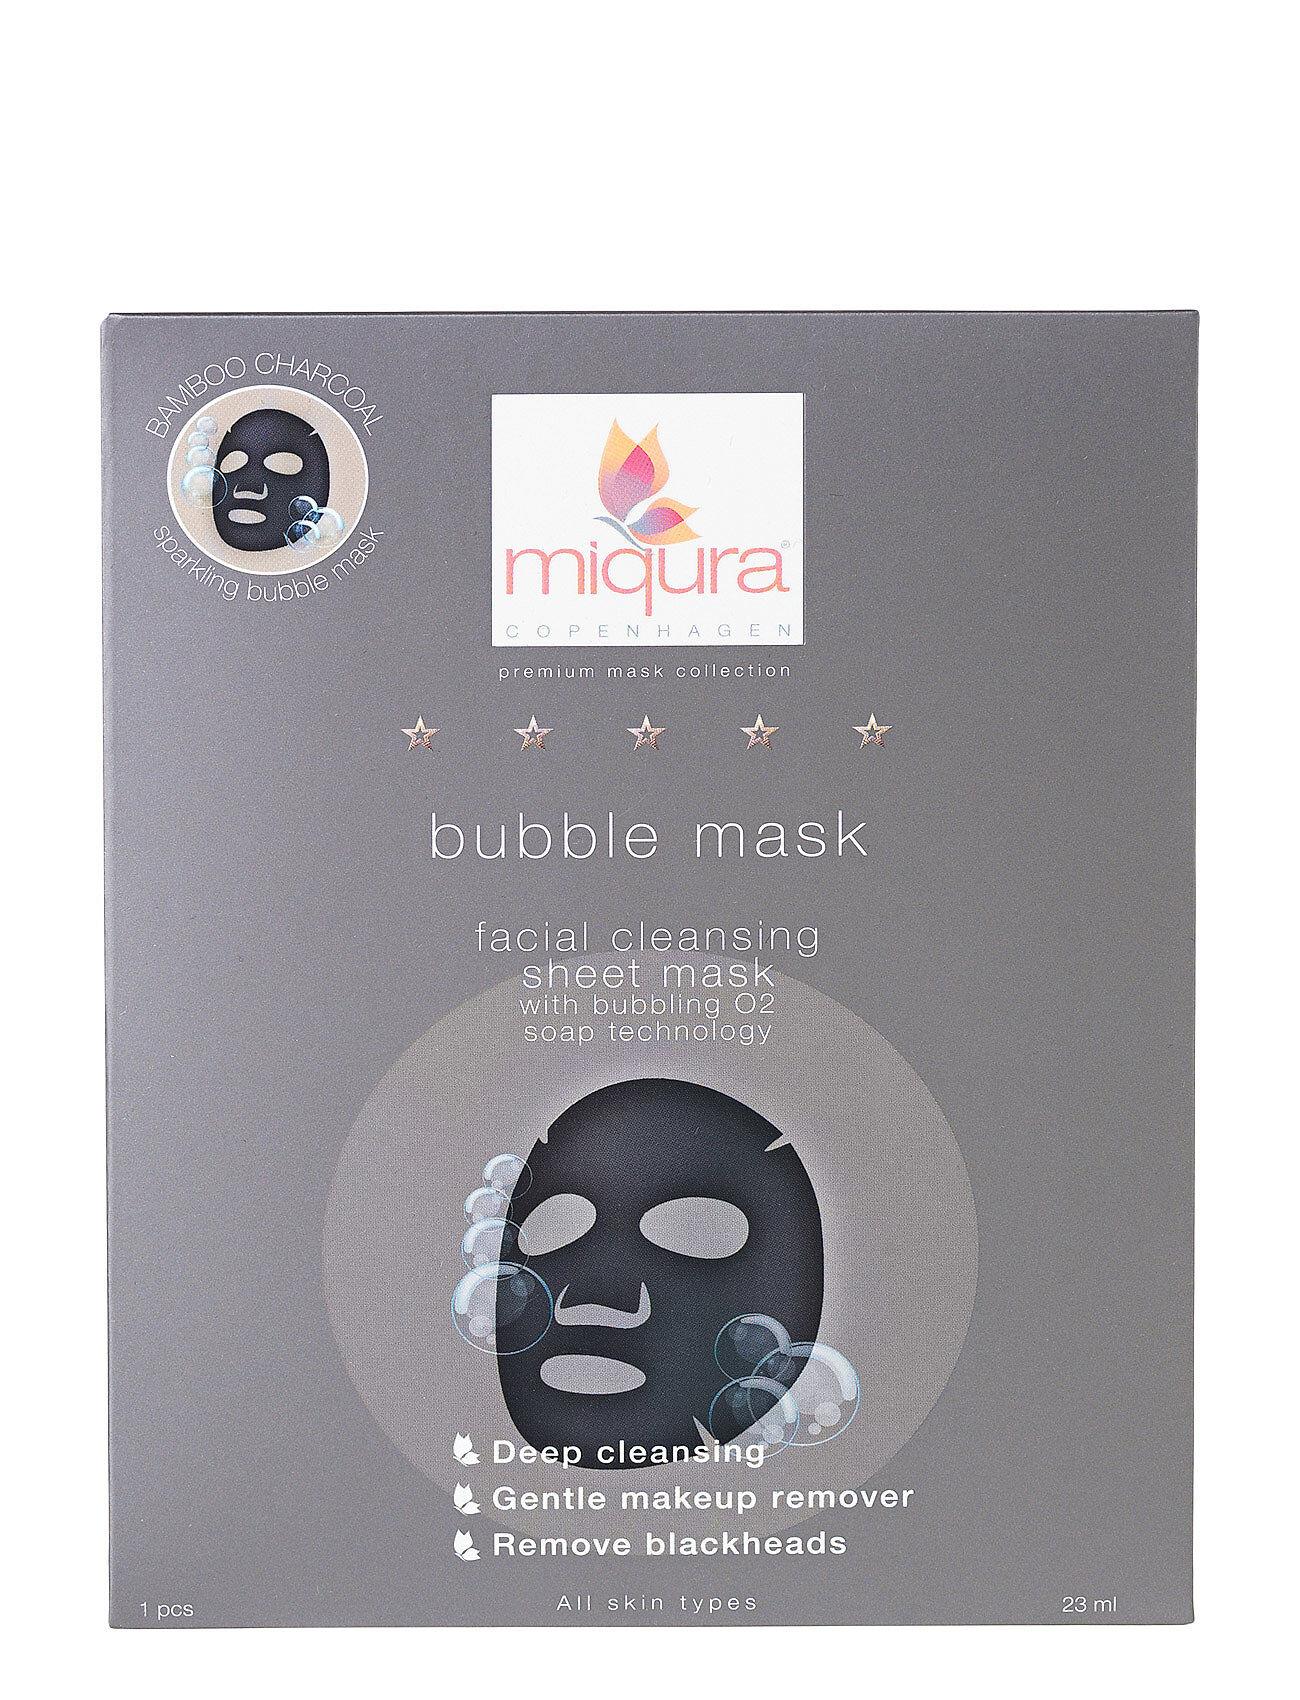 Miqura Bubble Mask Box Beauty WOMEN Skin Care Face Sheet Mask Nude Miqura